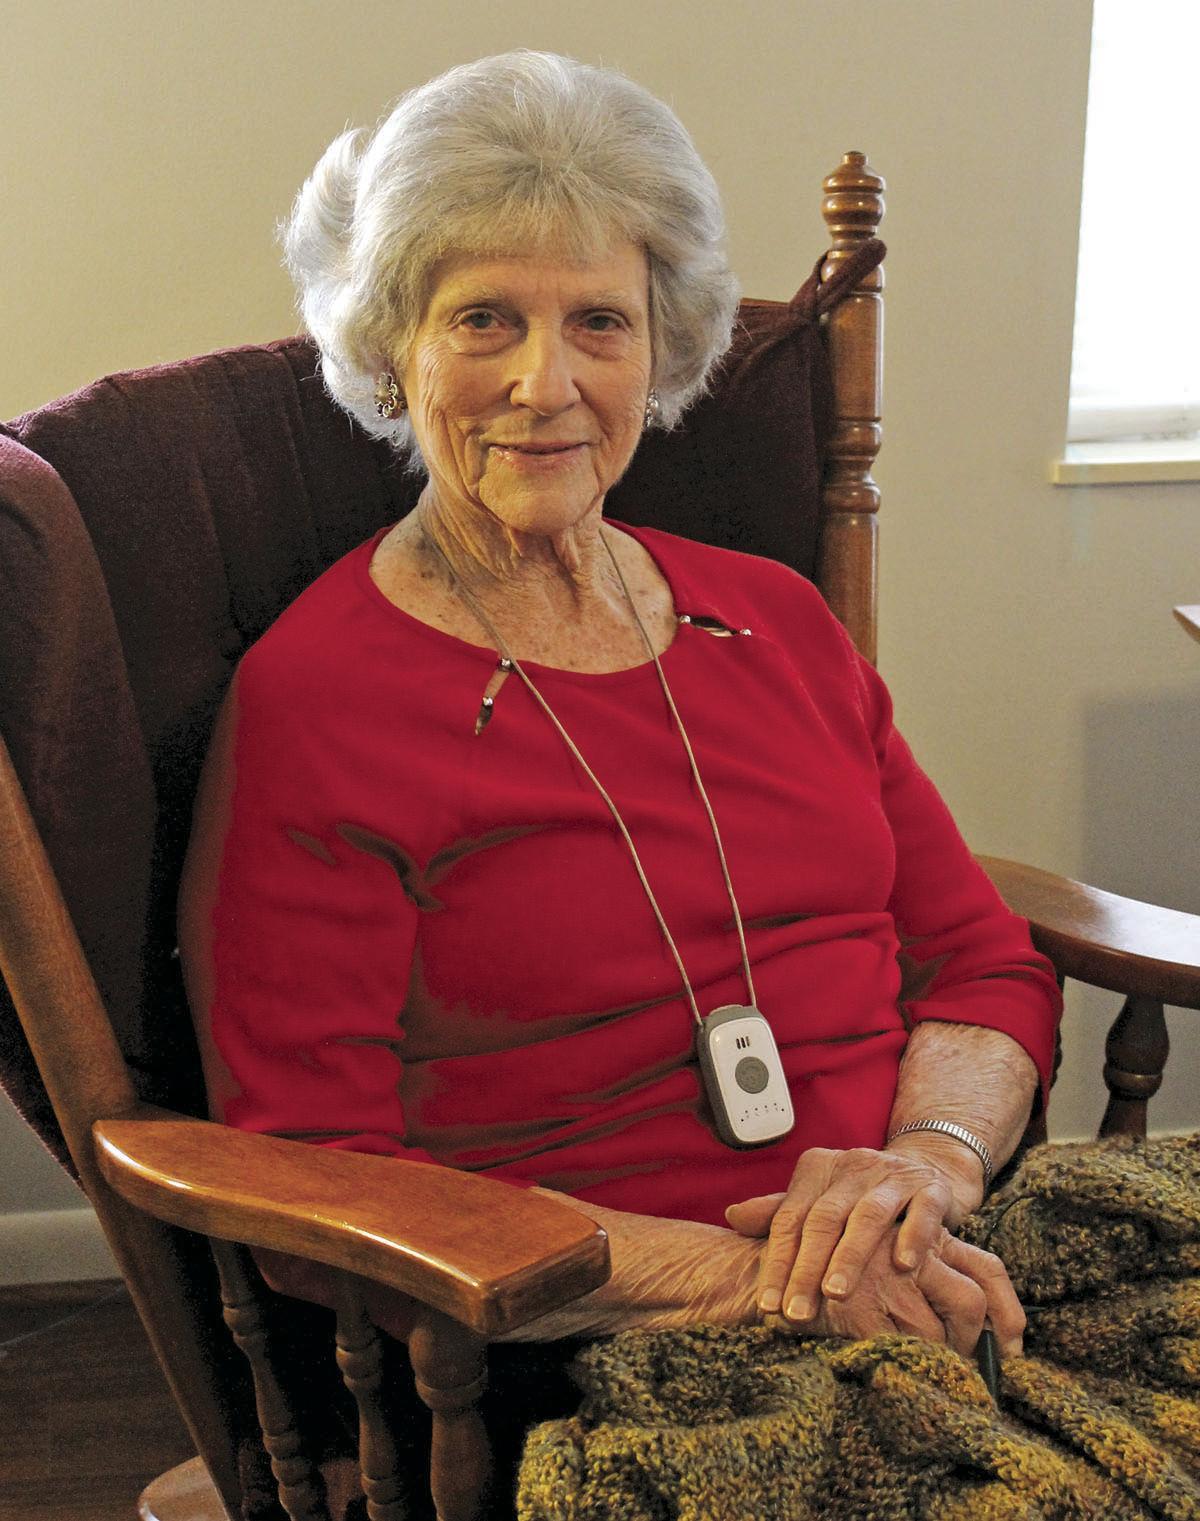 Florida native Gloria Allen has a zest for life